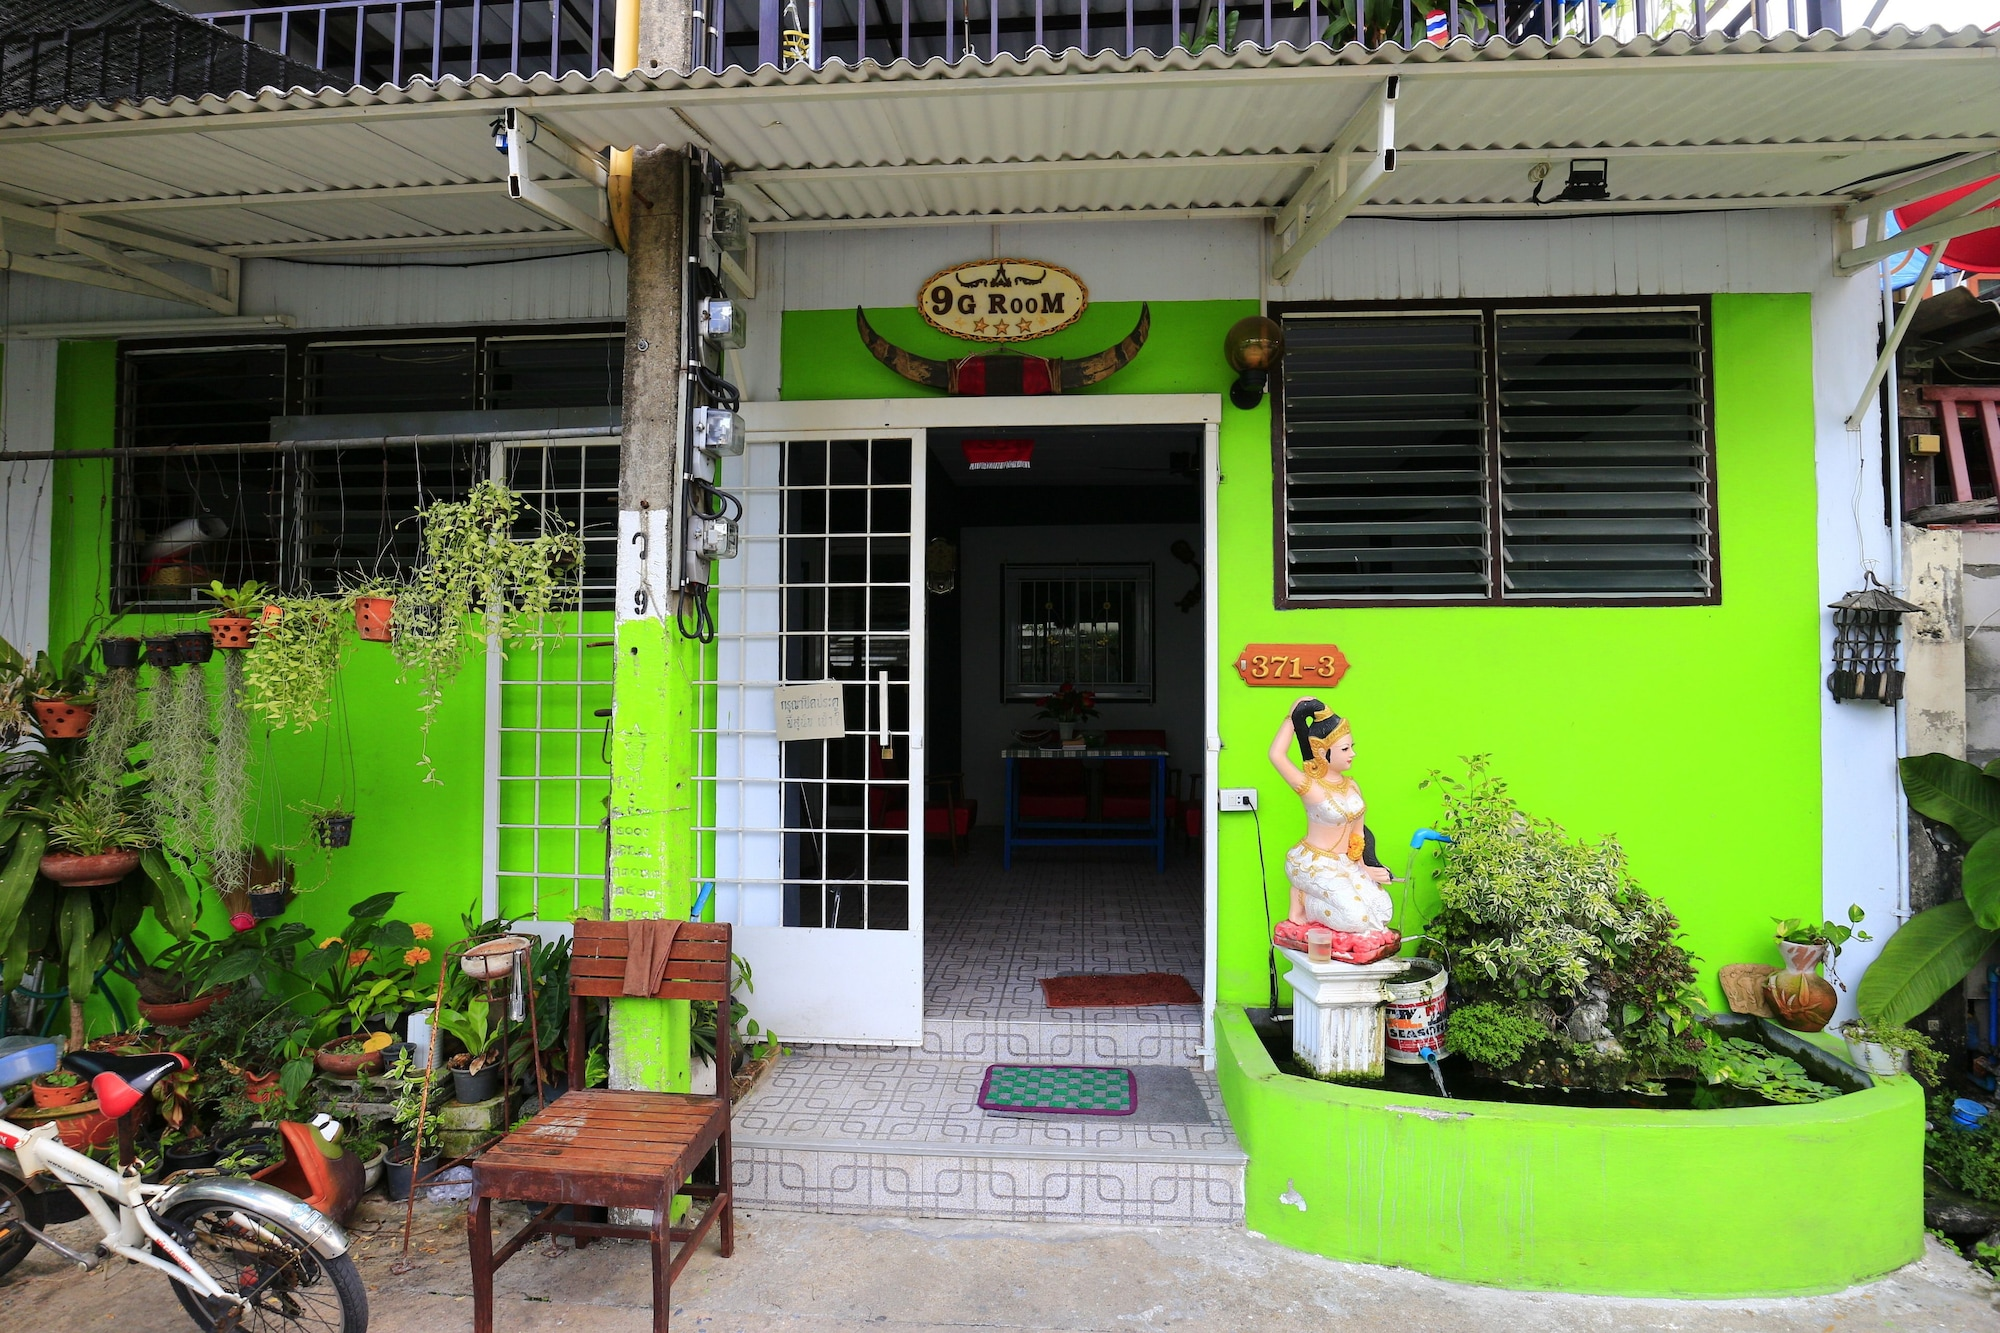 9G Room, Khlong San